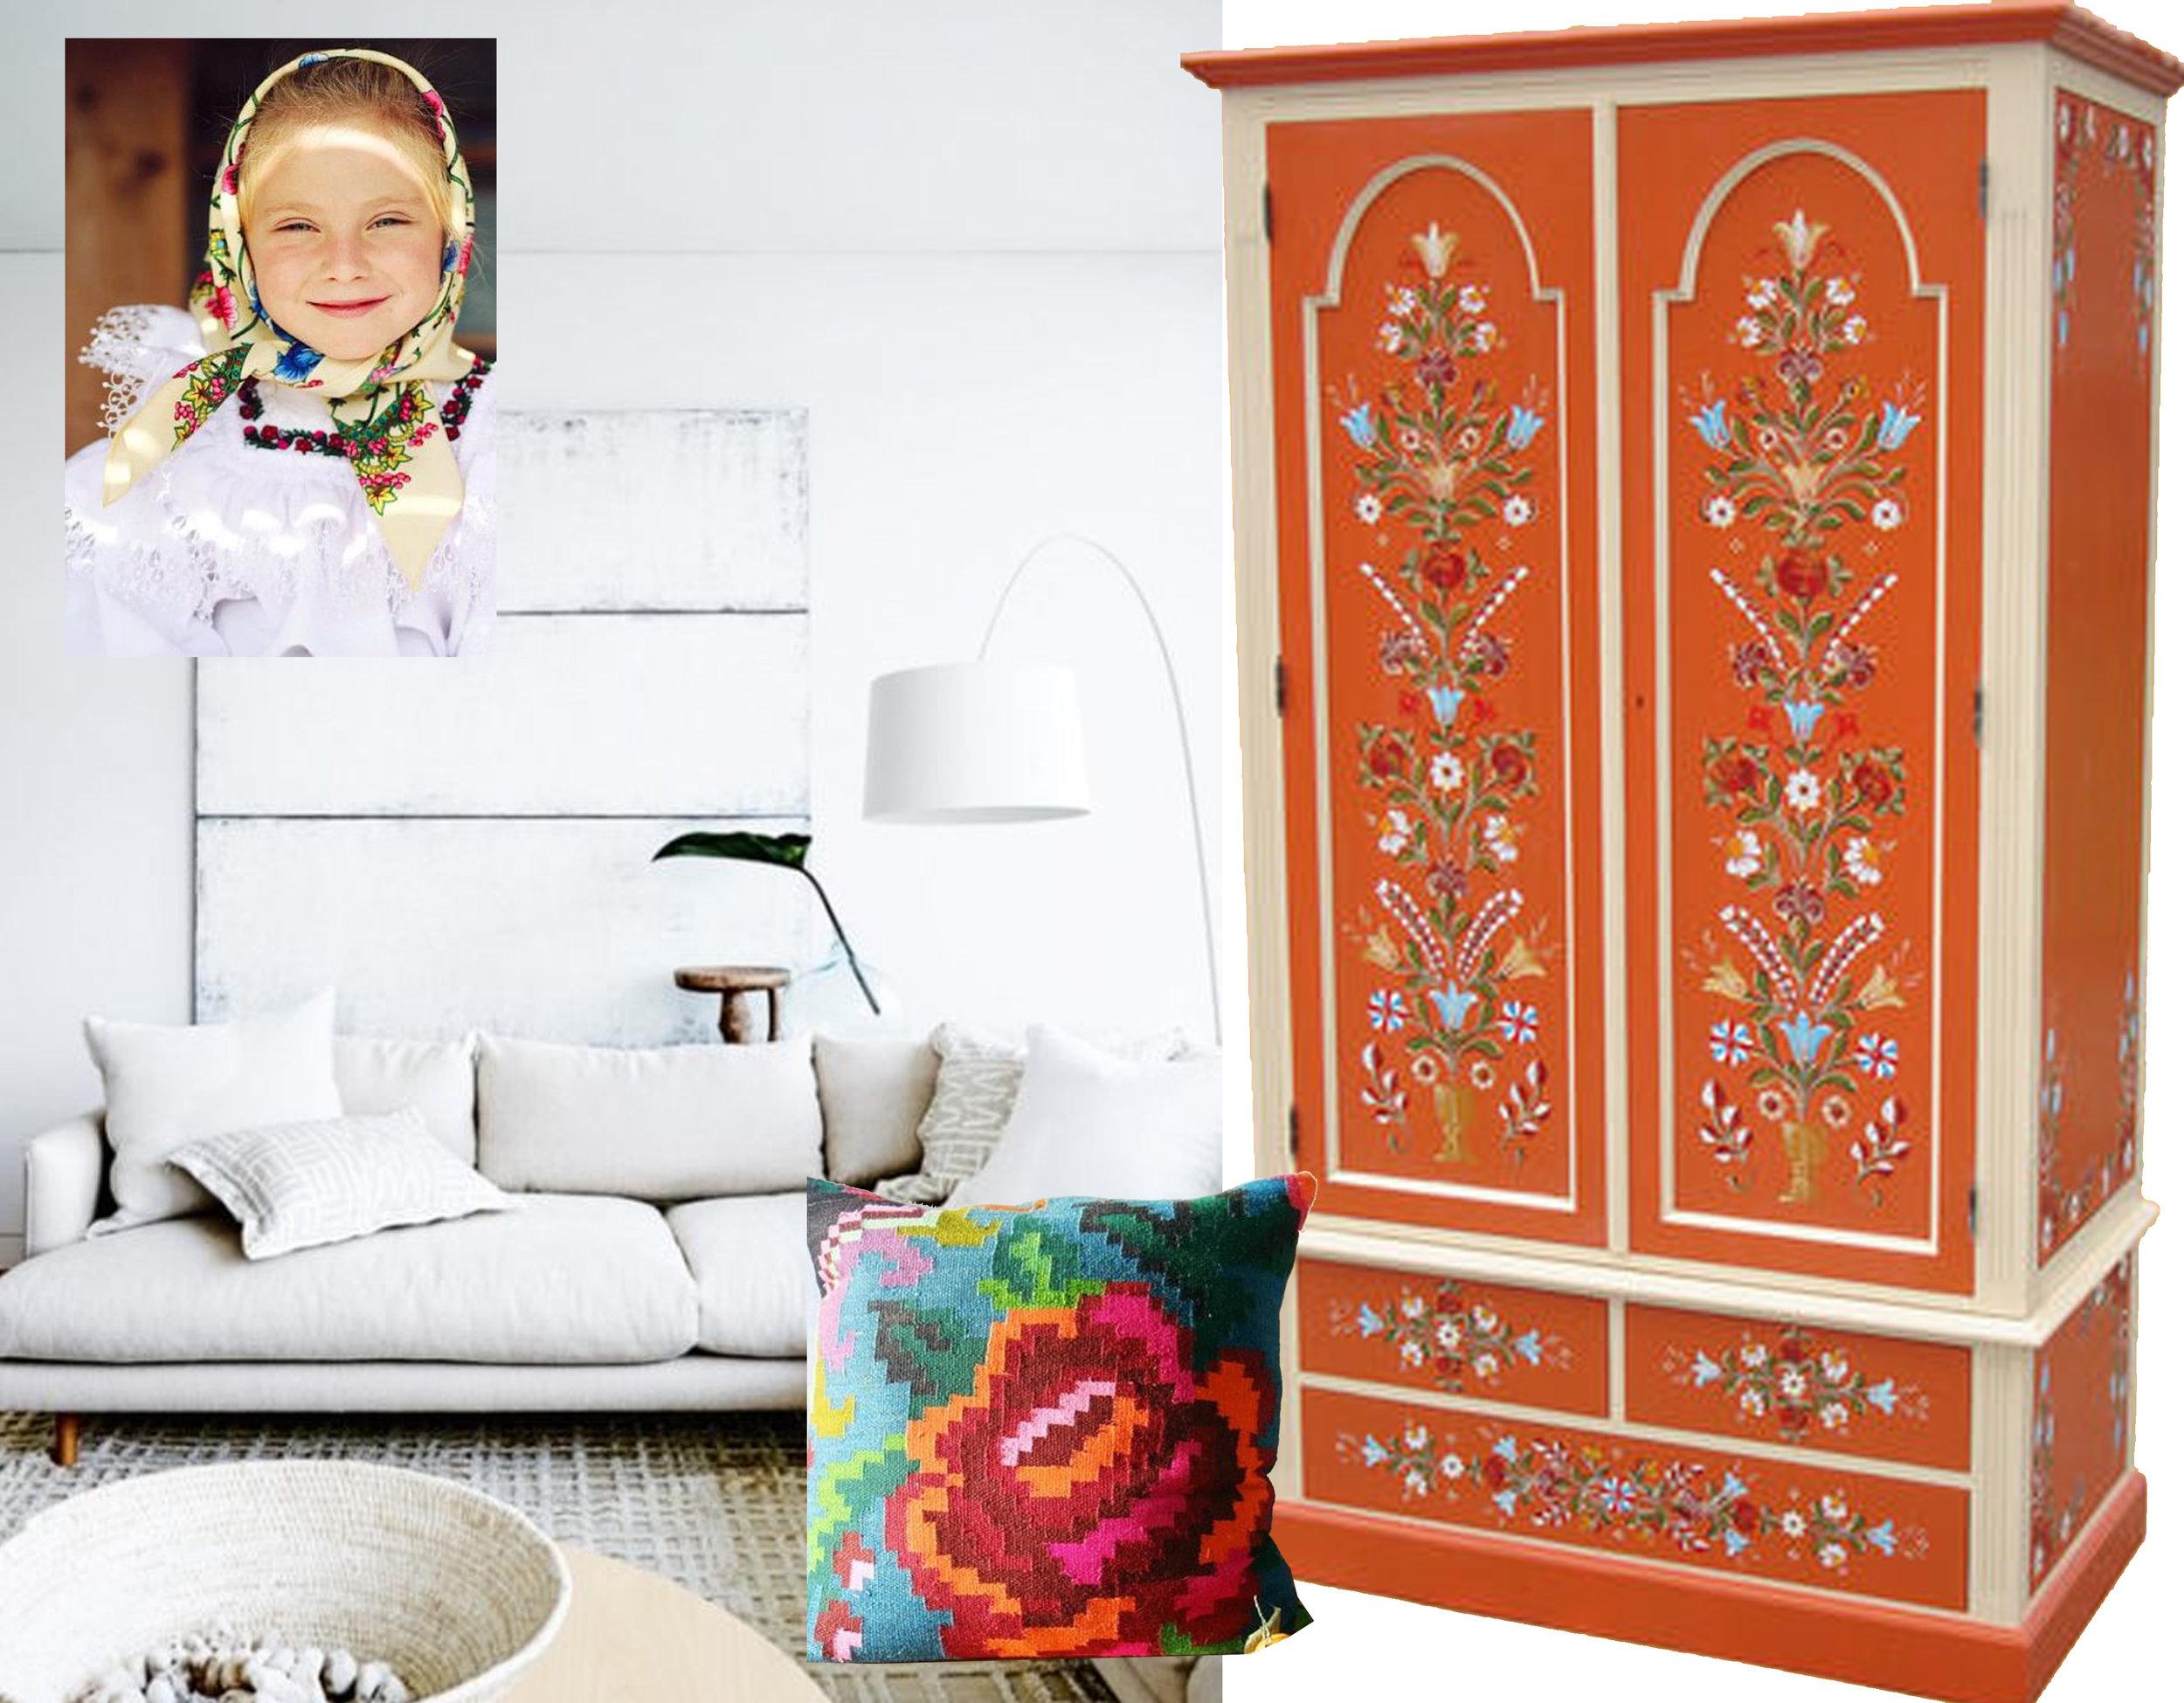 white interior via  The Home Scene  - painted furniture  Mobila Pictata - Romanian girl via  Pinterest  - pillow  The Homedit